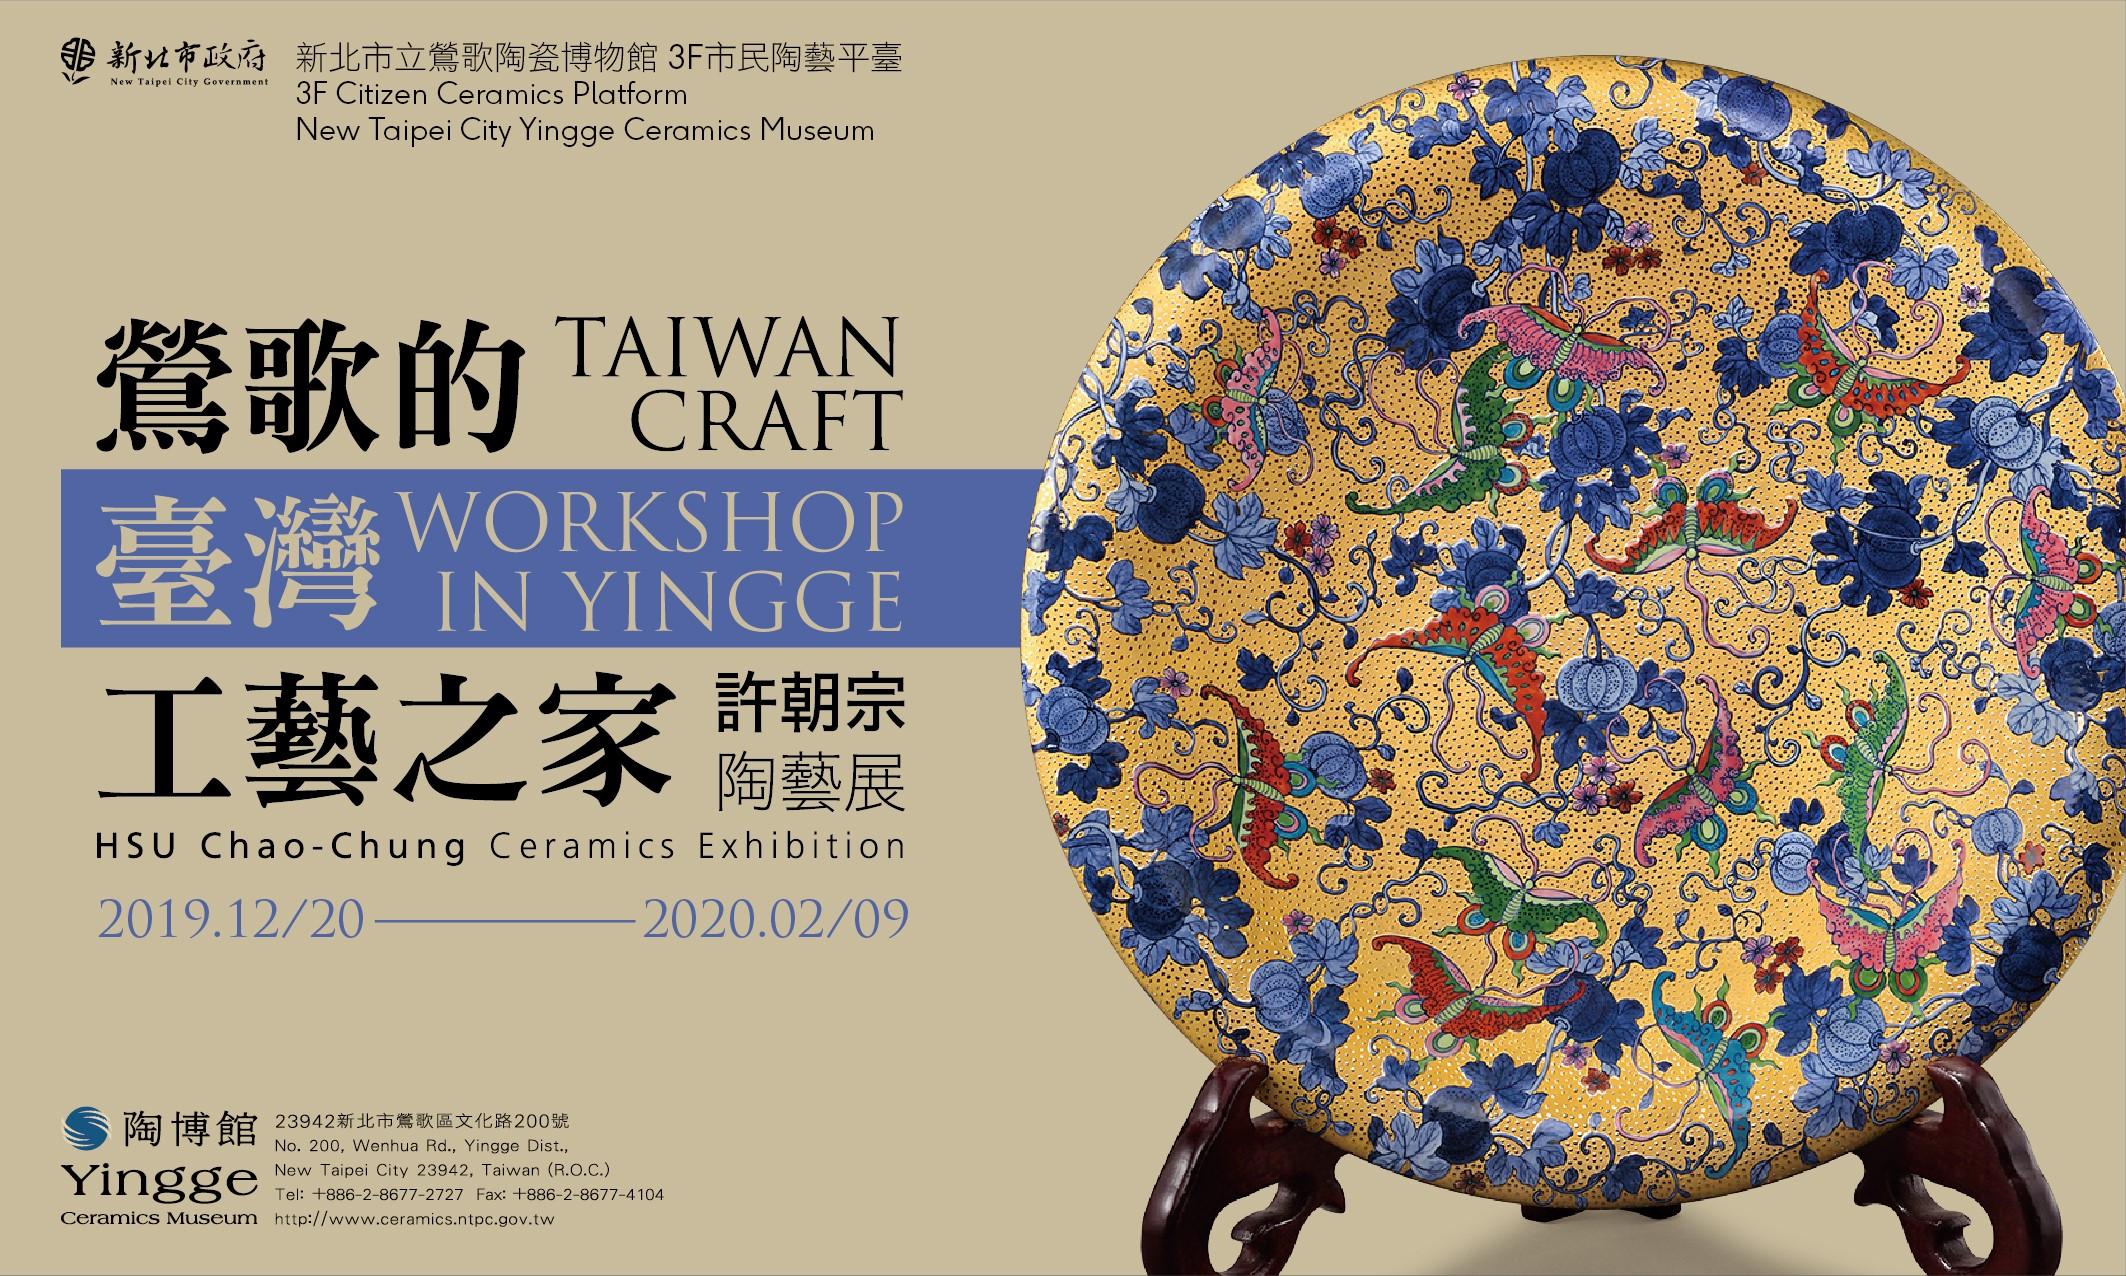 Taiwan Craft Workshop in Yingge – HSU Chao-Chung Ceramics Exhibition